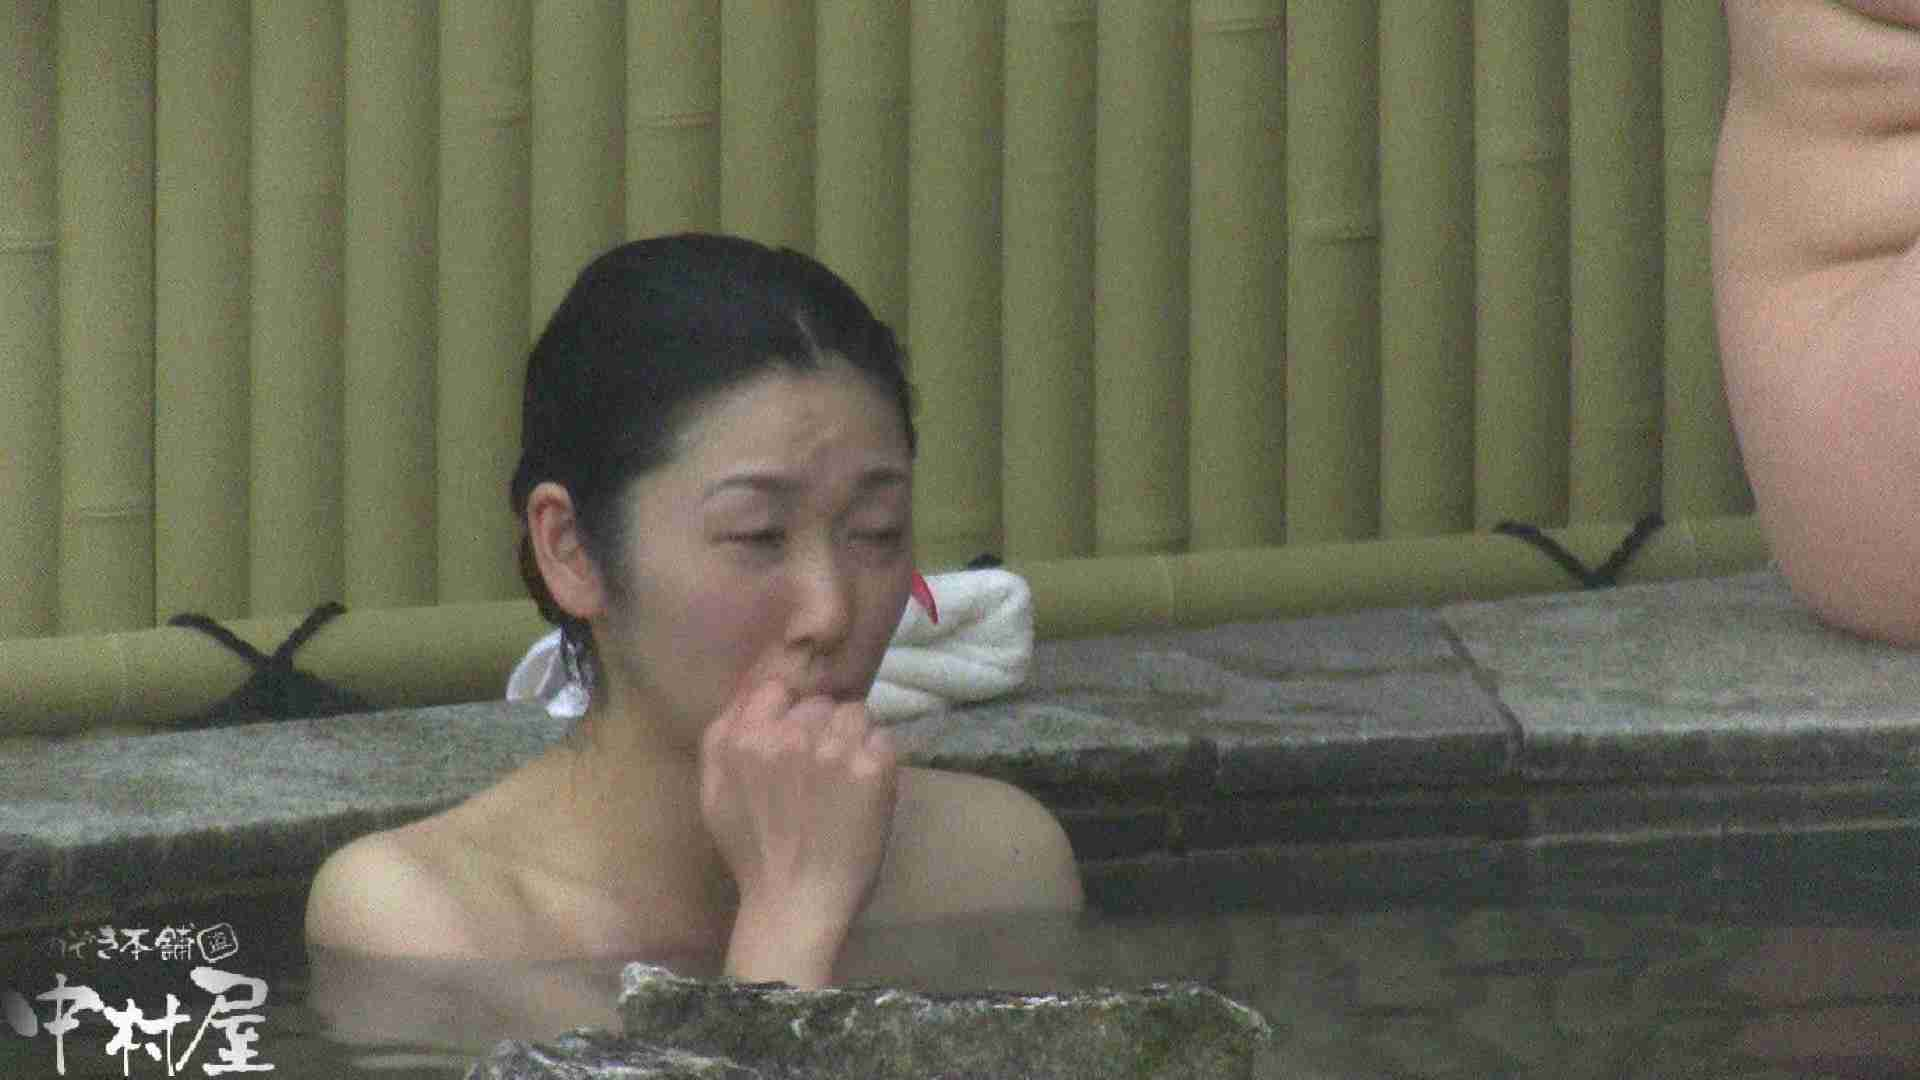 Aquaな露天風呂Vol.917 盗撮シリーズ   露天風呂編  108PIX 49